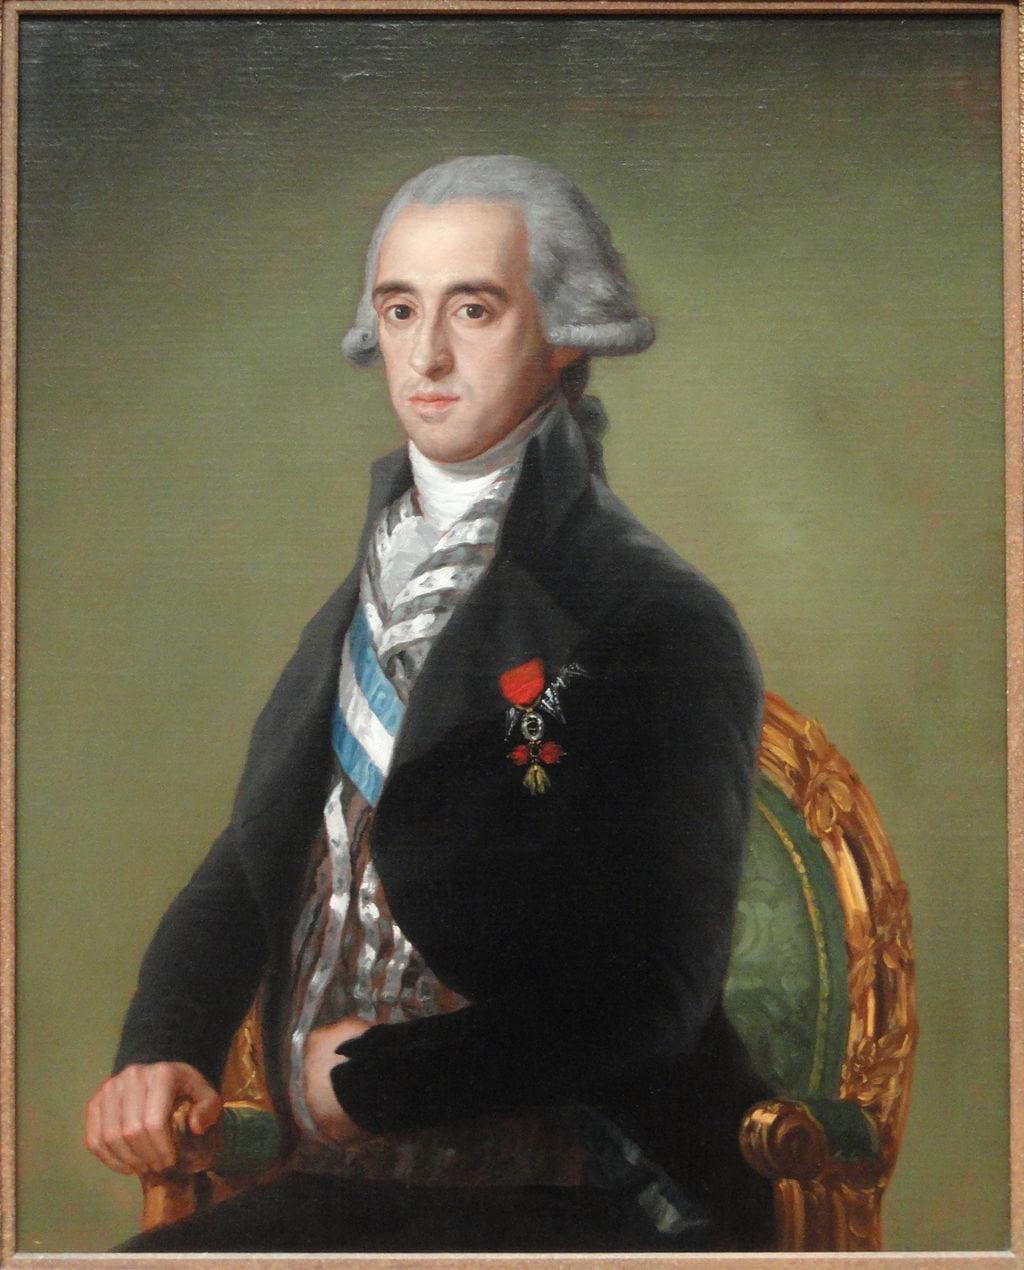 Francisco de Goya y Lucientes (Spanish, 1746 - 1828), Portrait of José Alvarez de Toledo, Duke of Alba, c. 1795, Wikimedia Commons